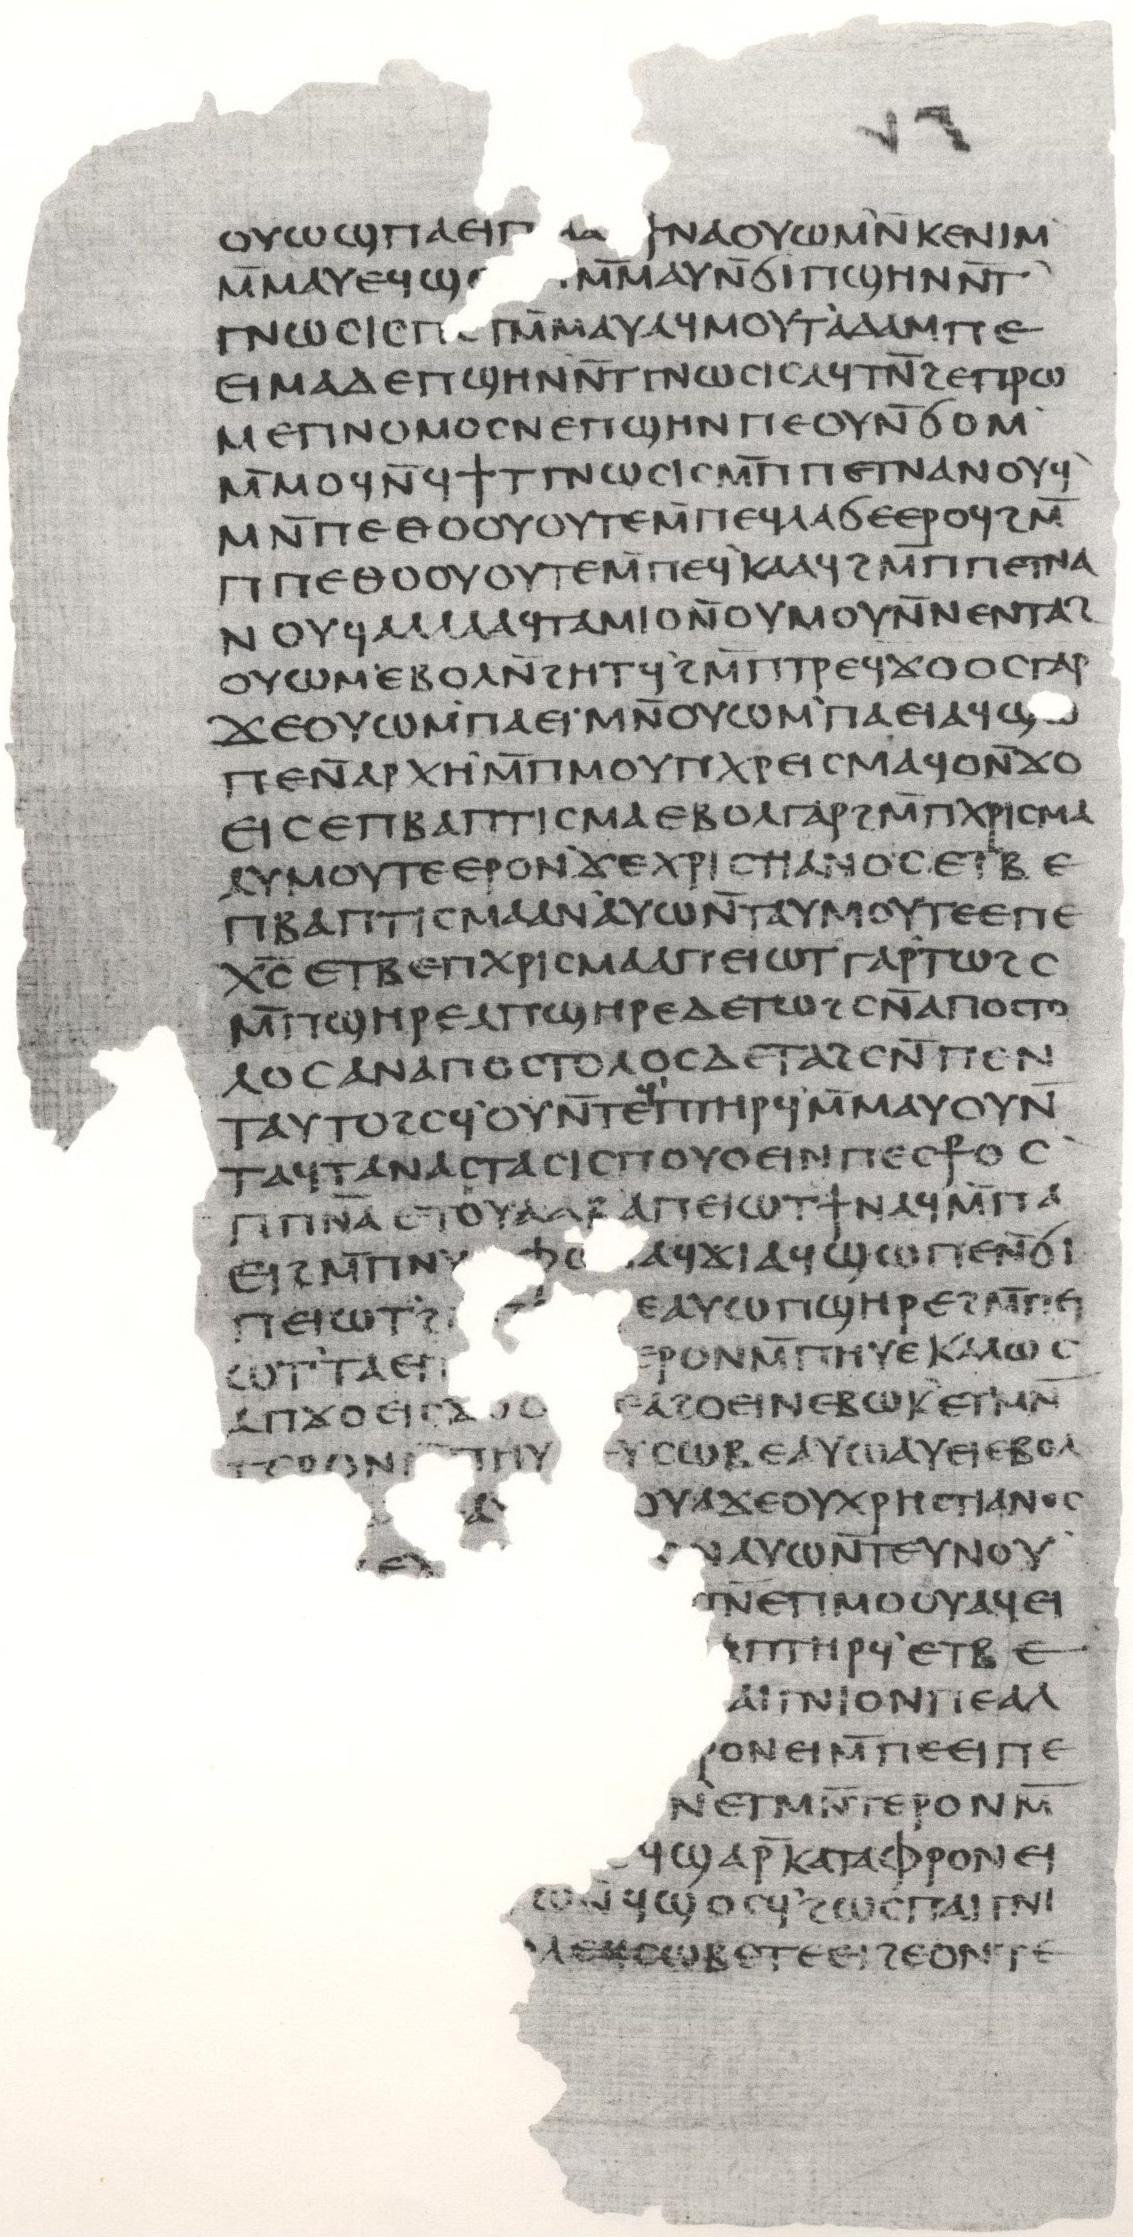 Gospel_of_Philip_facsimile_Page_74.jpg